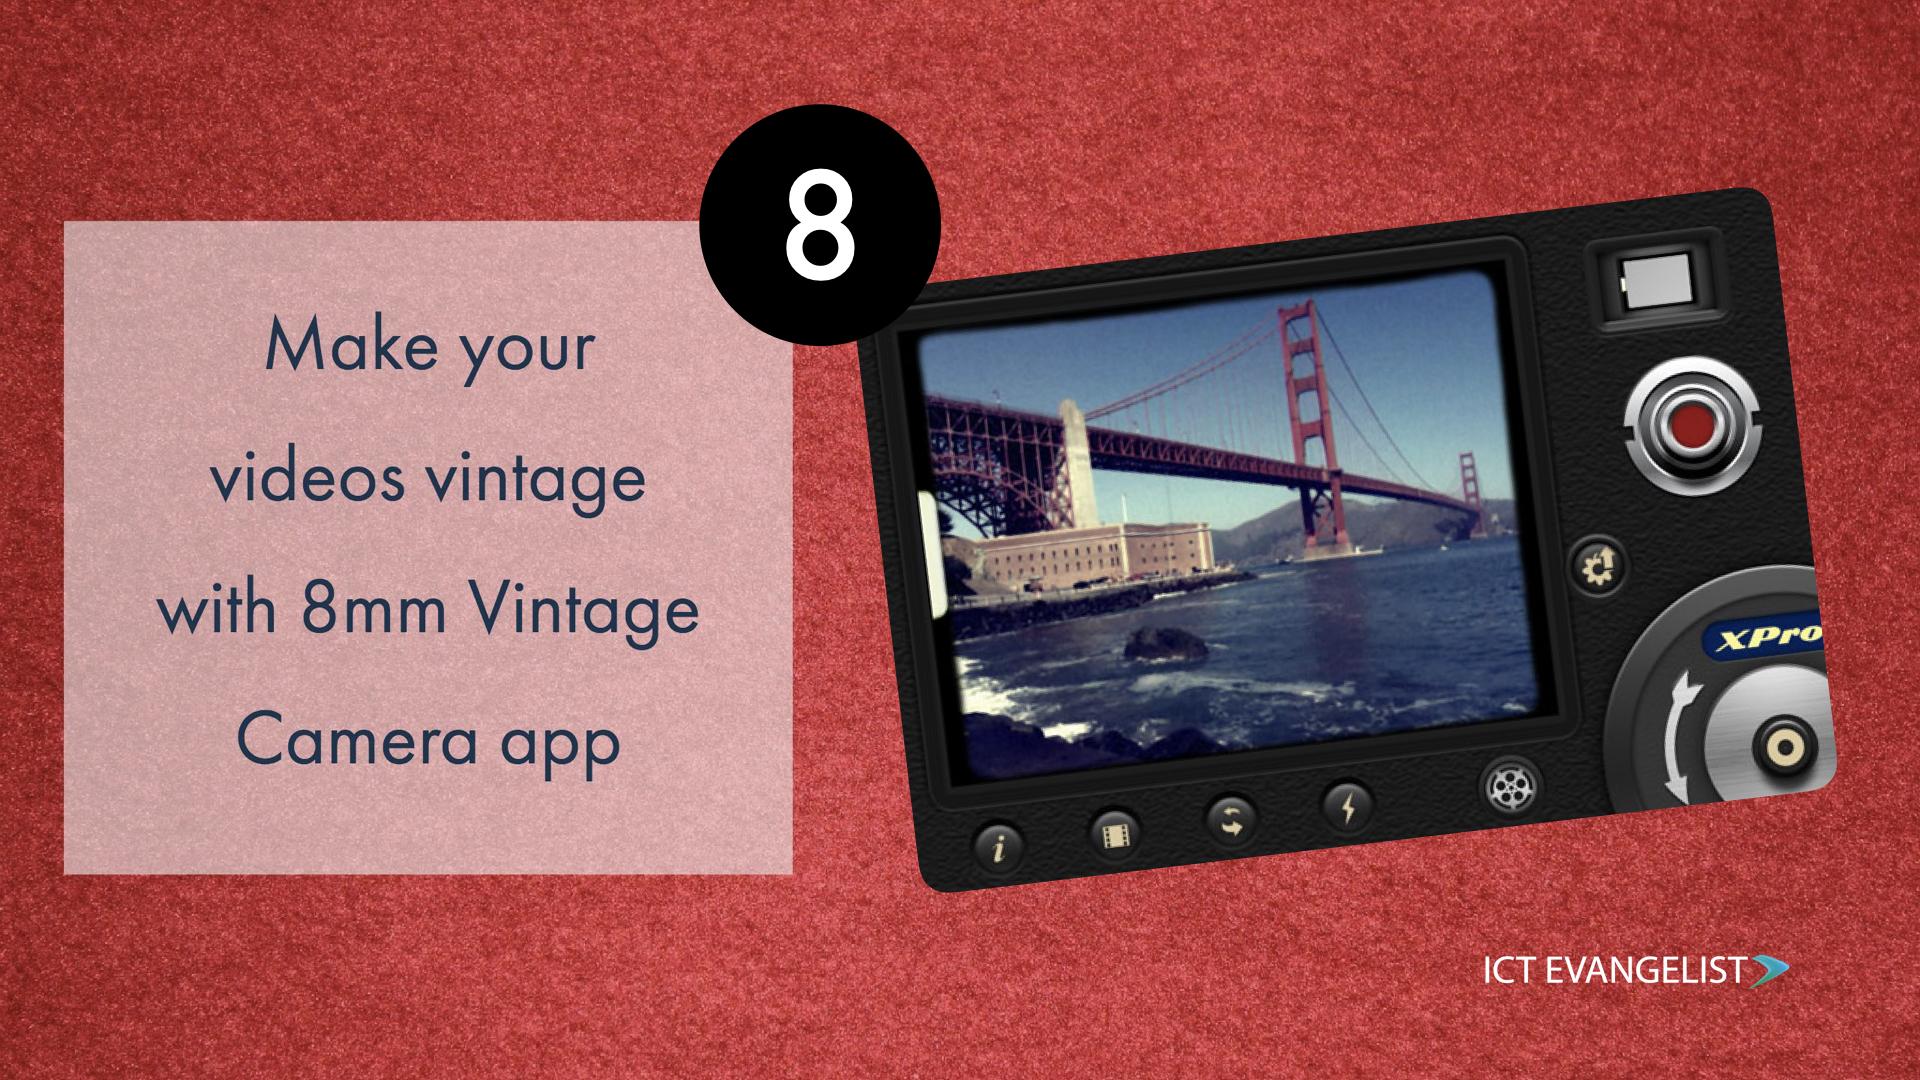 Make your videos vintage with 8mm – ICTEvangelist